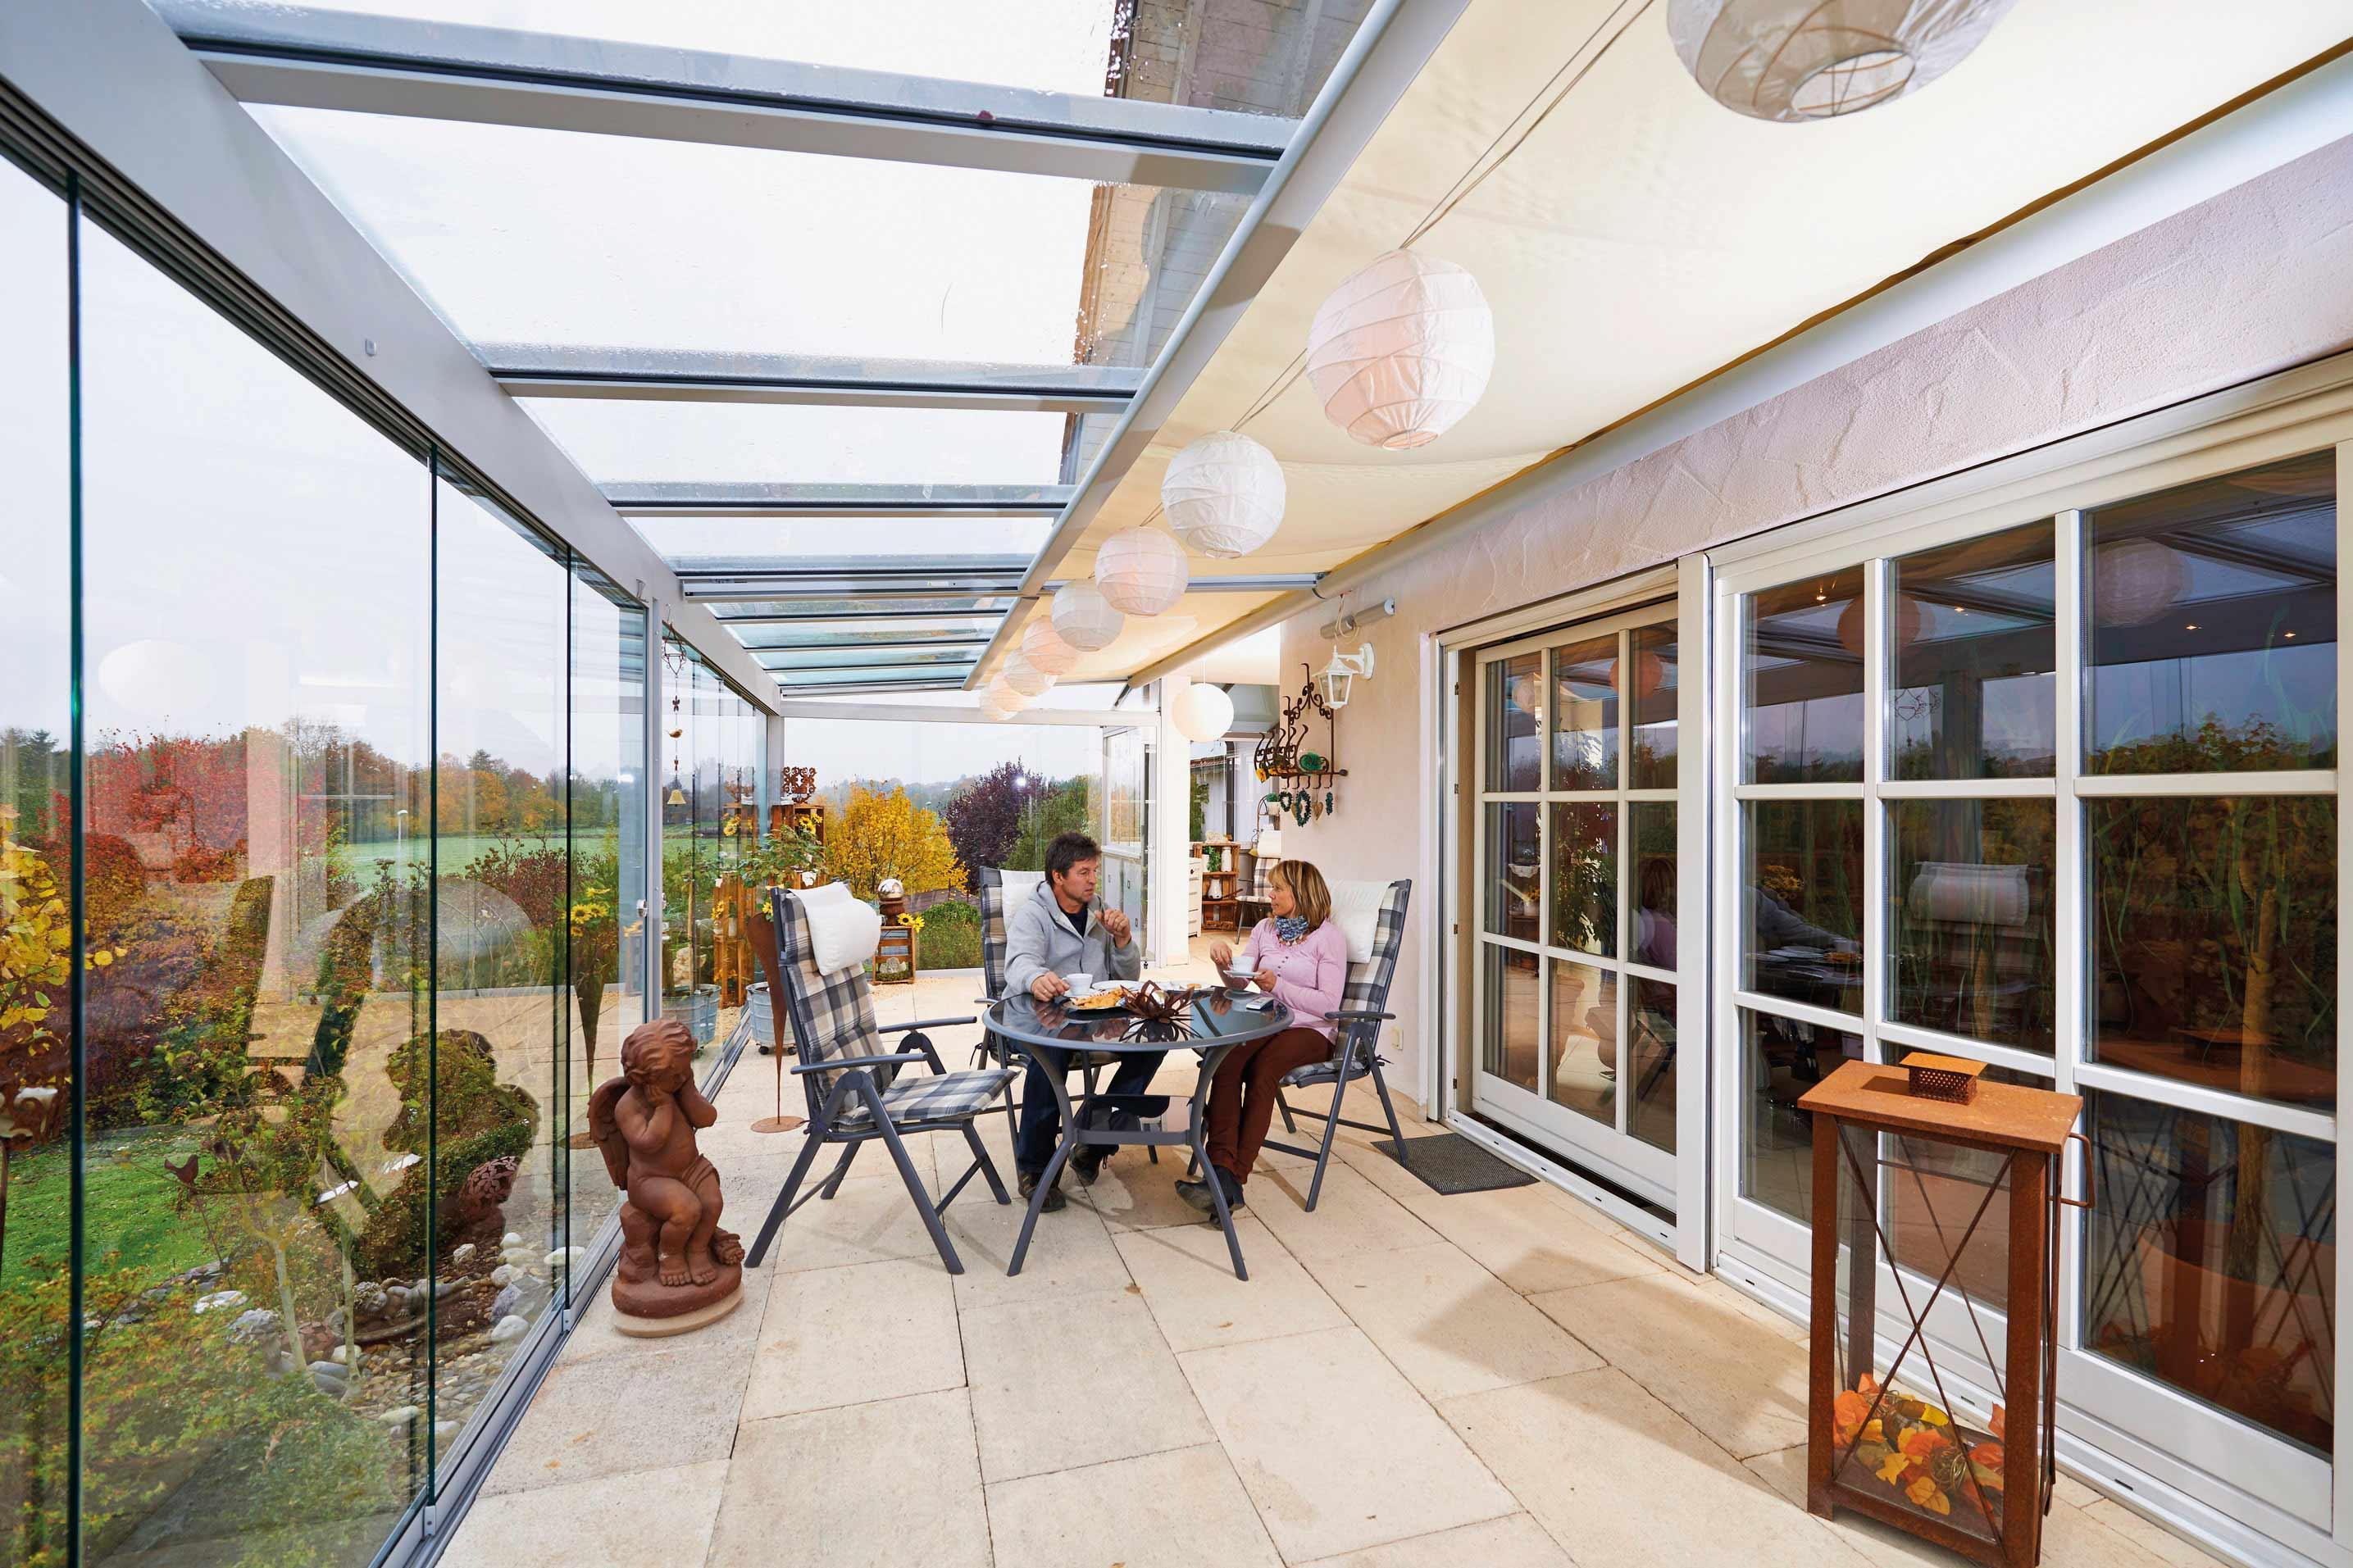 langer sommer dank dem wetterschutz f r die terrasse. Black Bedroom Furniture Sets. Home Design Ideas